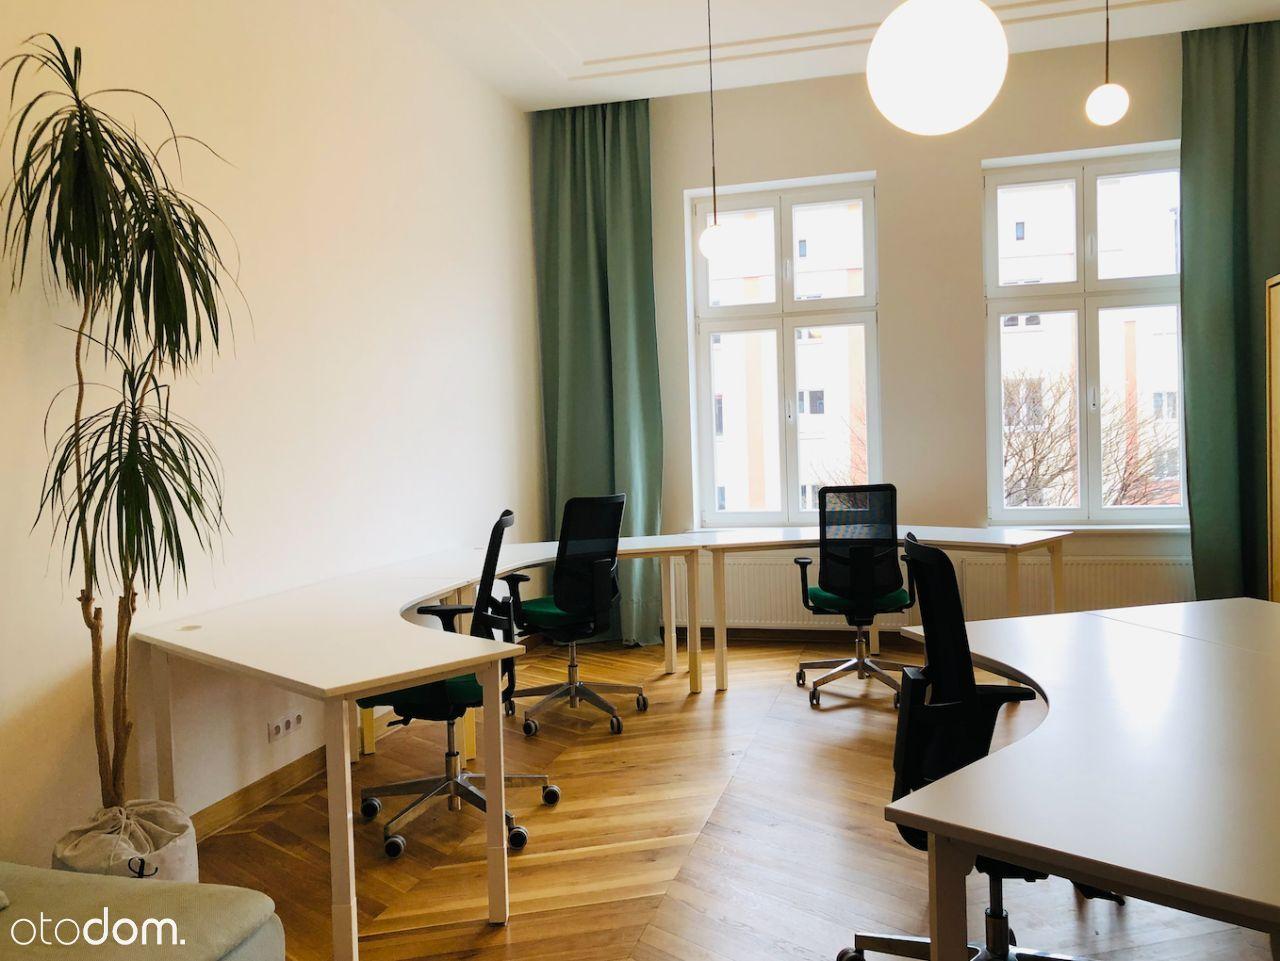 biuro lokal biurowy powierzchnia biurowa